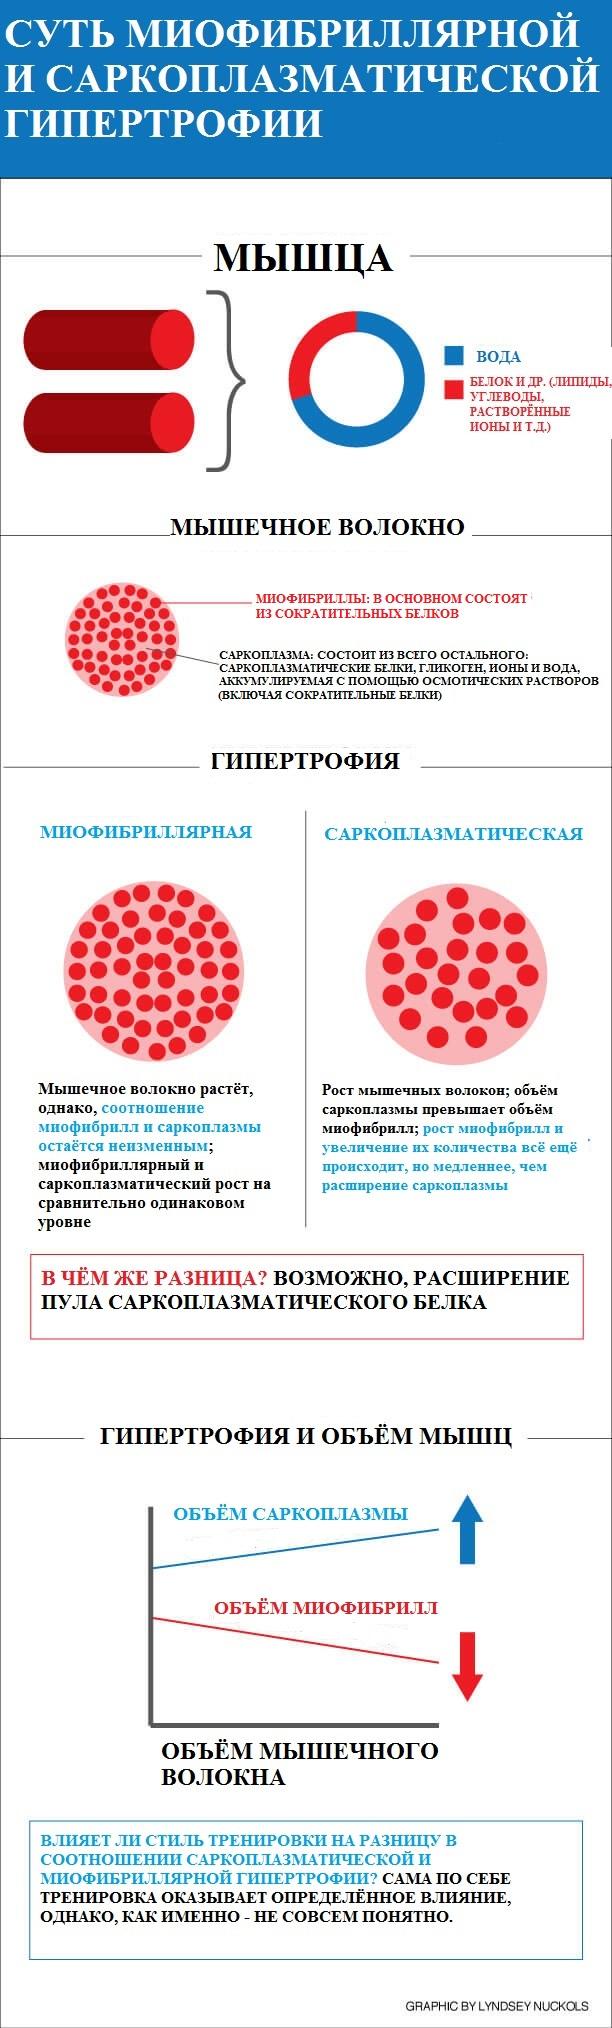 Саркоплазма